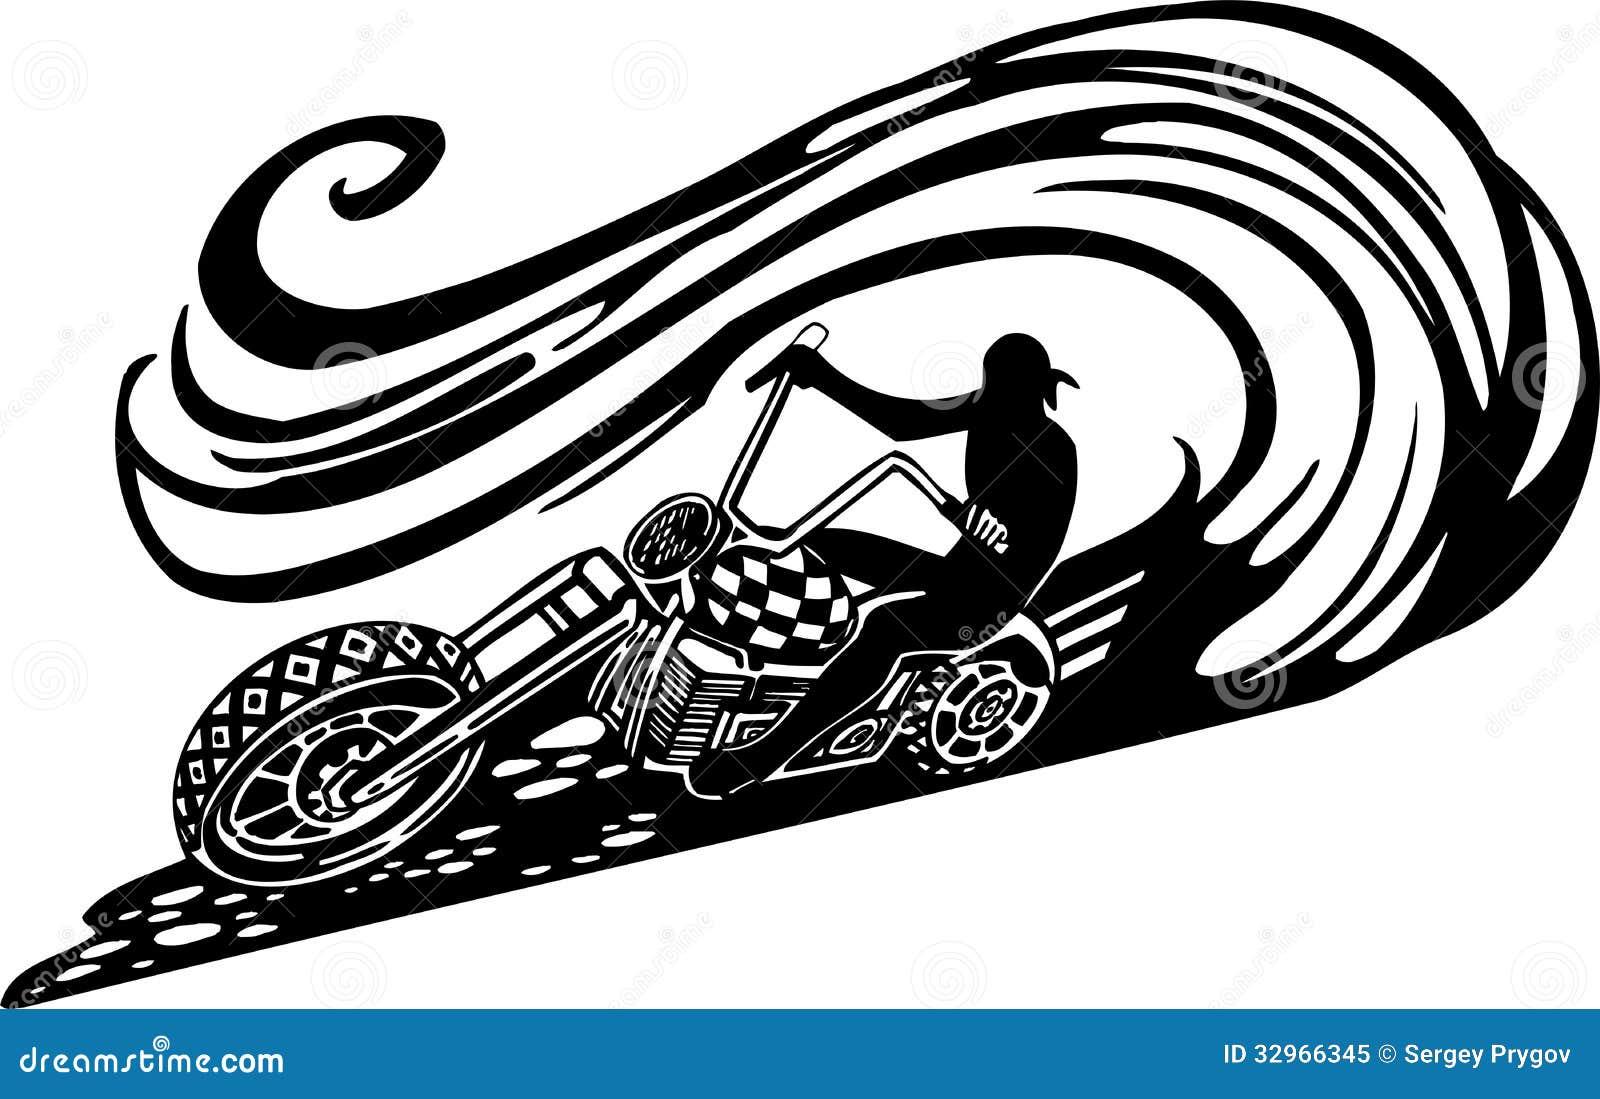 Motorbike, Chopper - Vector Illustration. Stock Vector ...